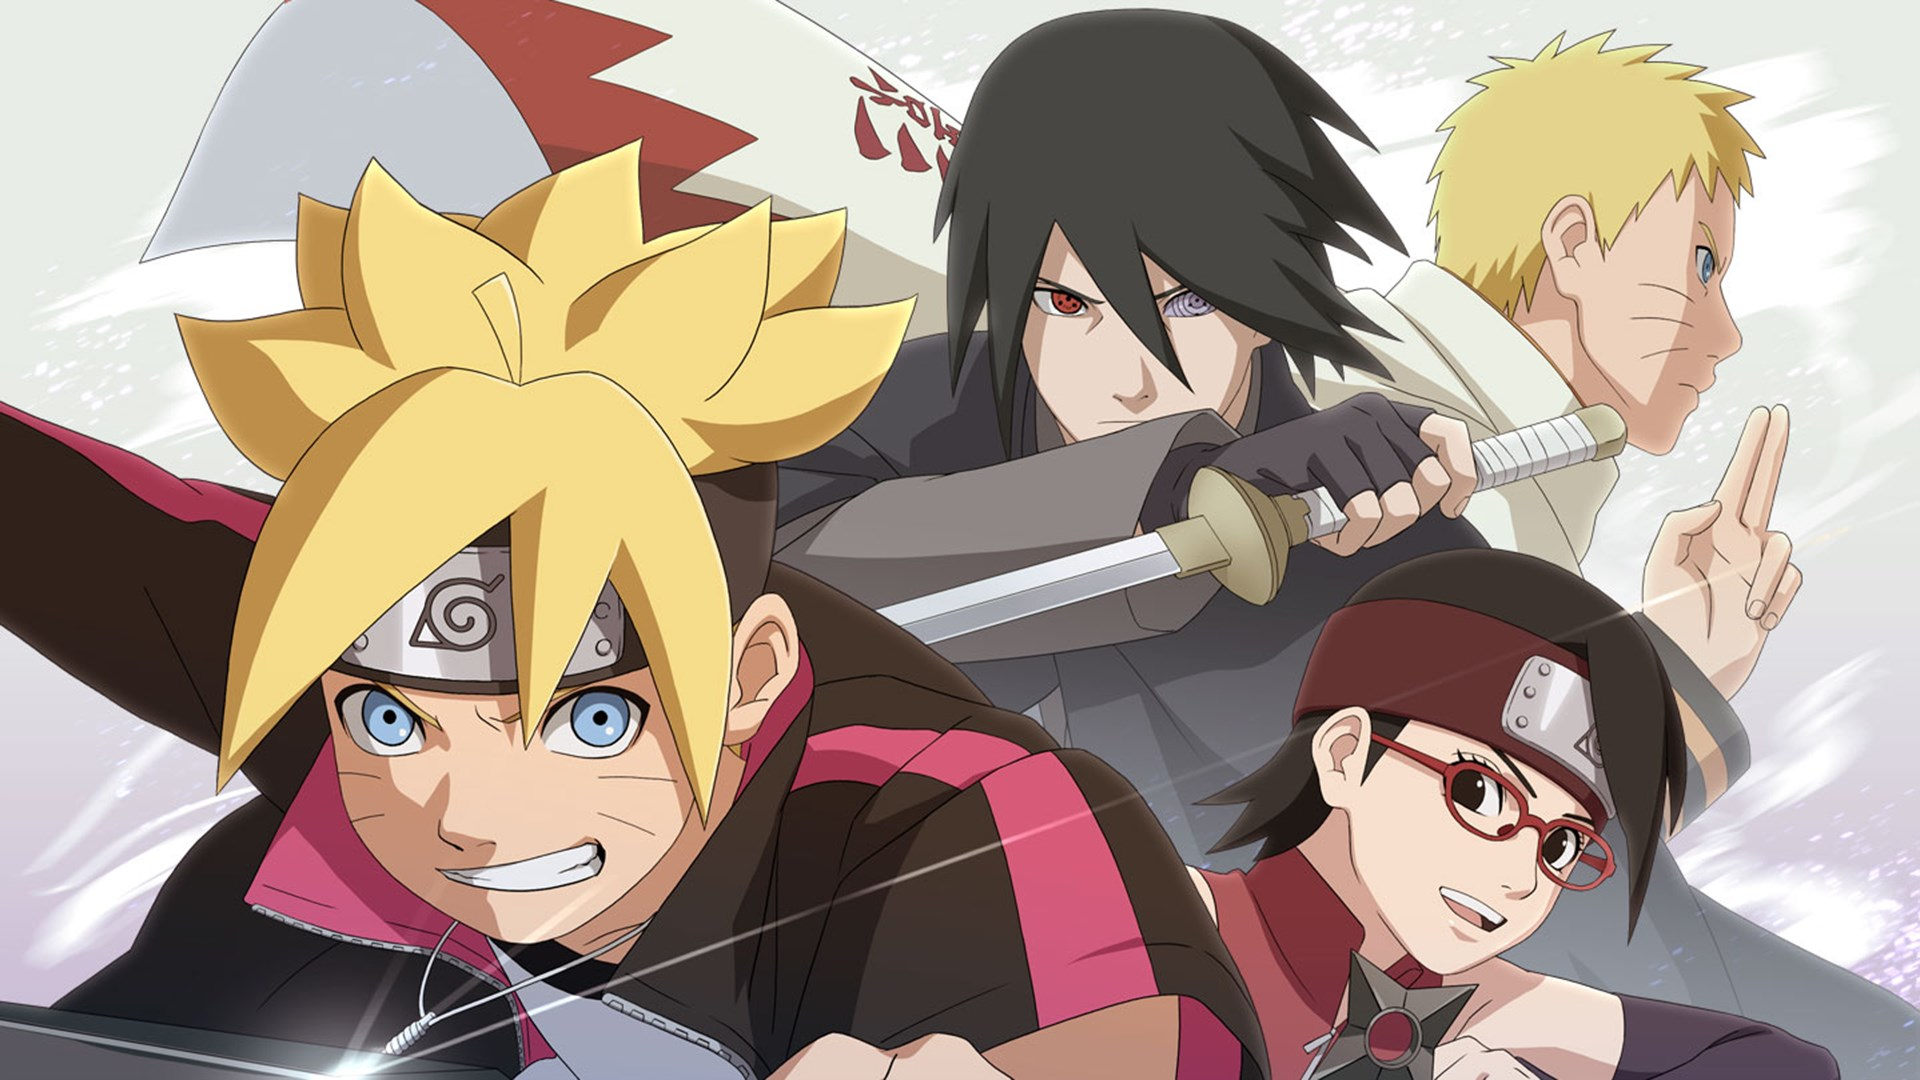 The Top 5 Most Intelligent Konoha Ninja's In Boruto Naruto Next Generations